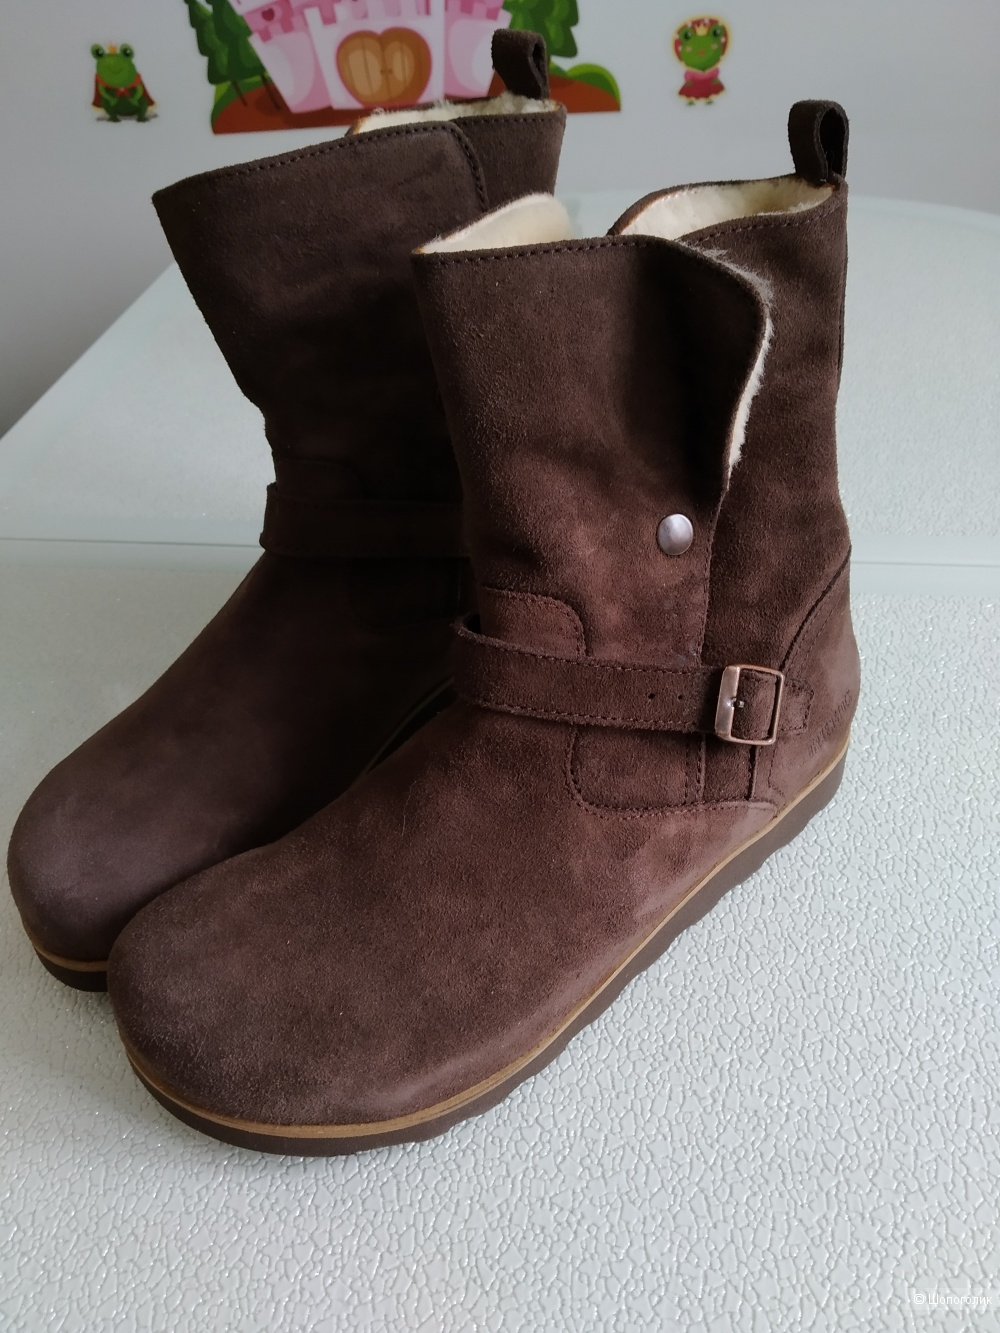 Ботинки Birkenstock размер 40